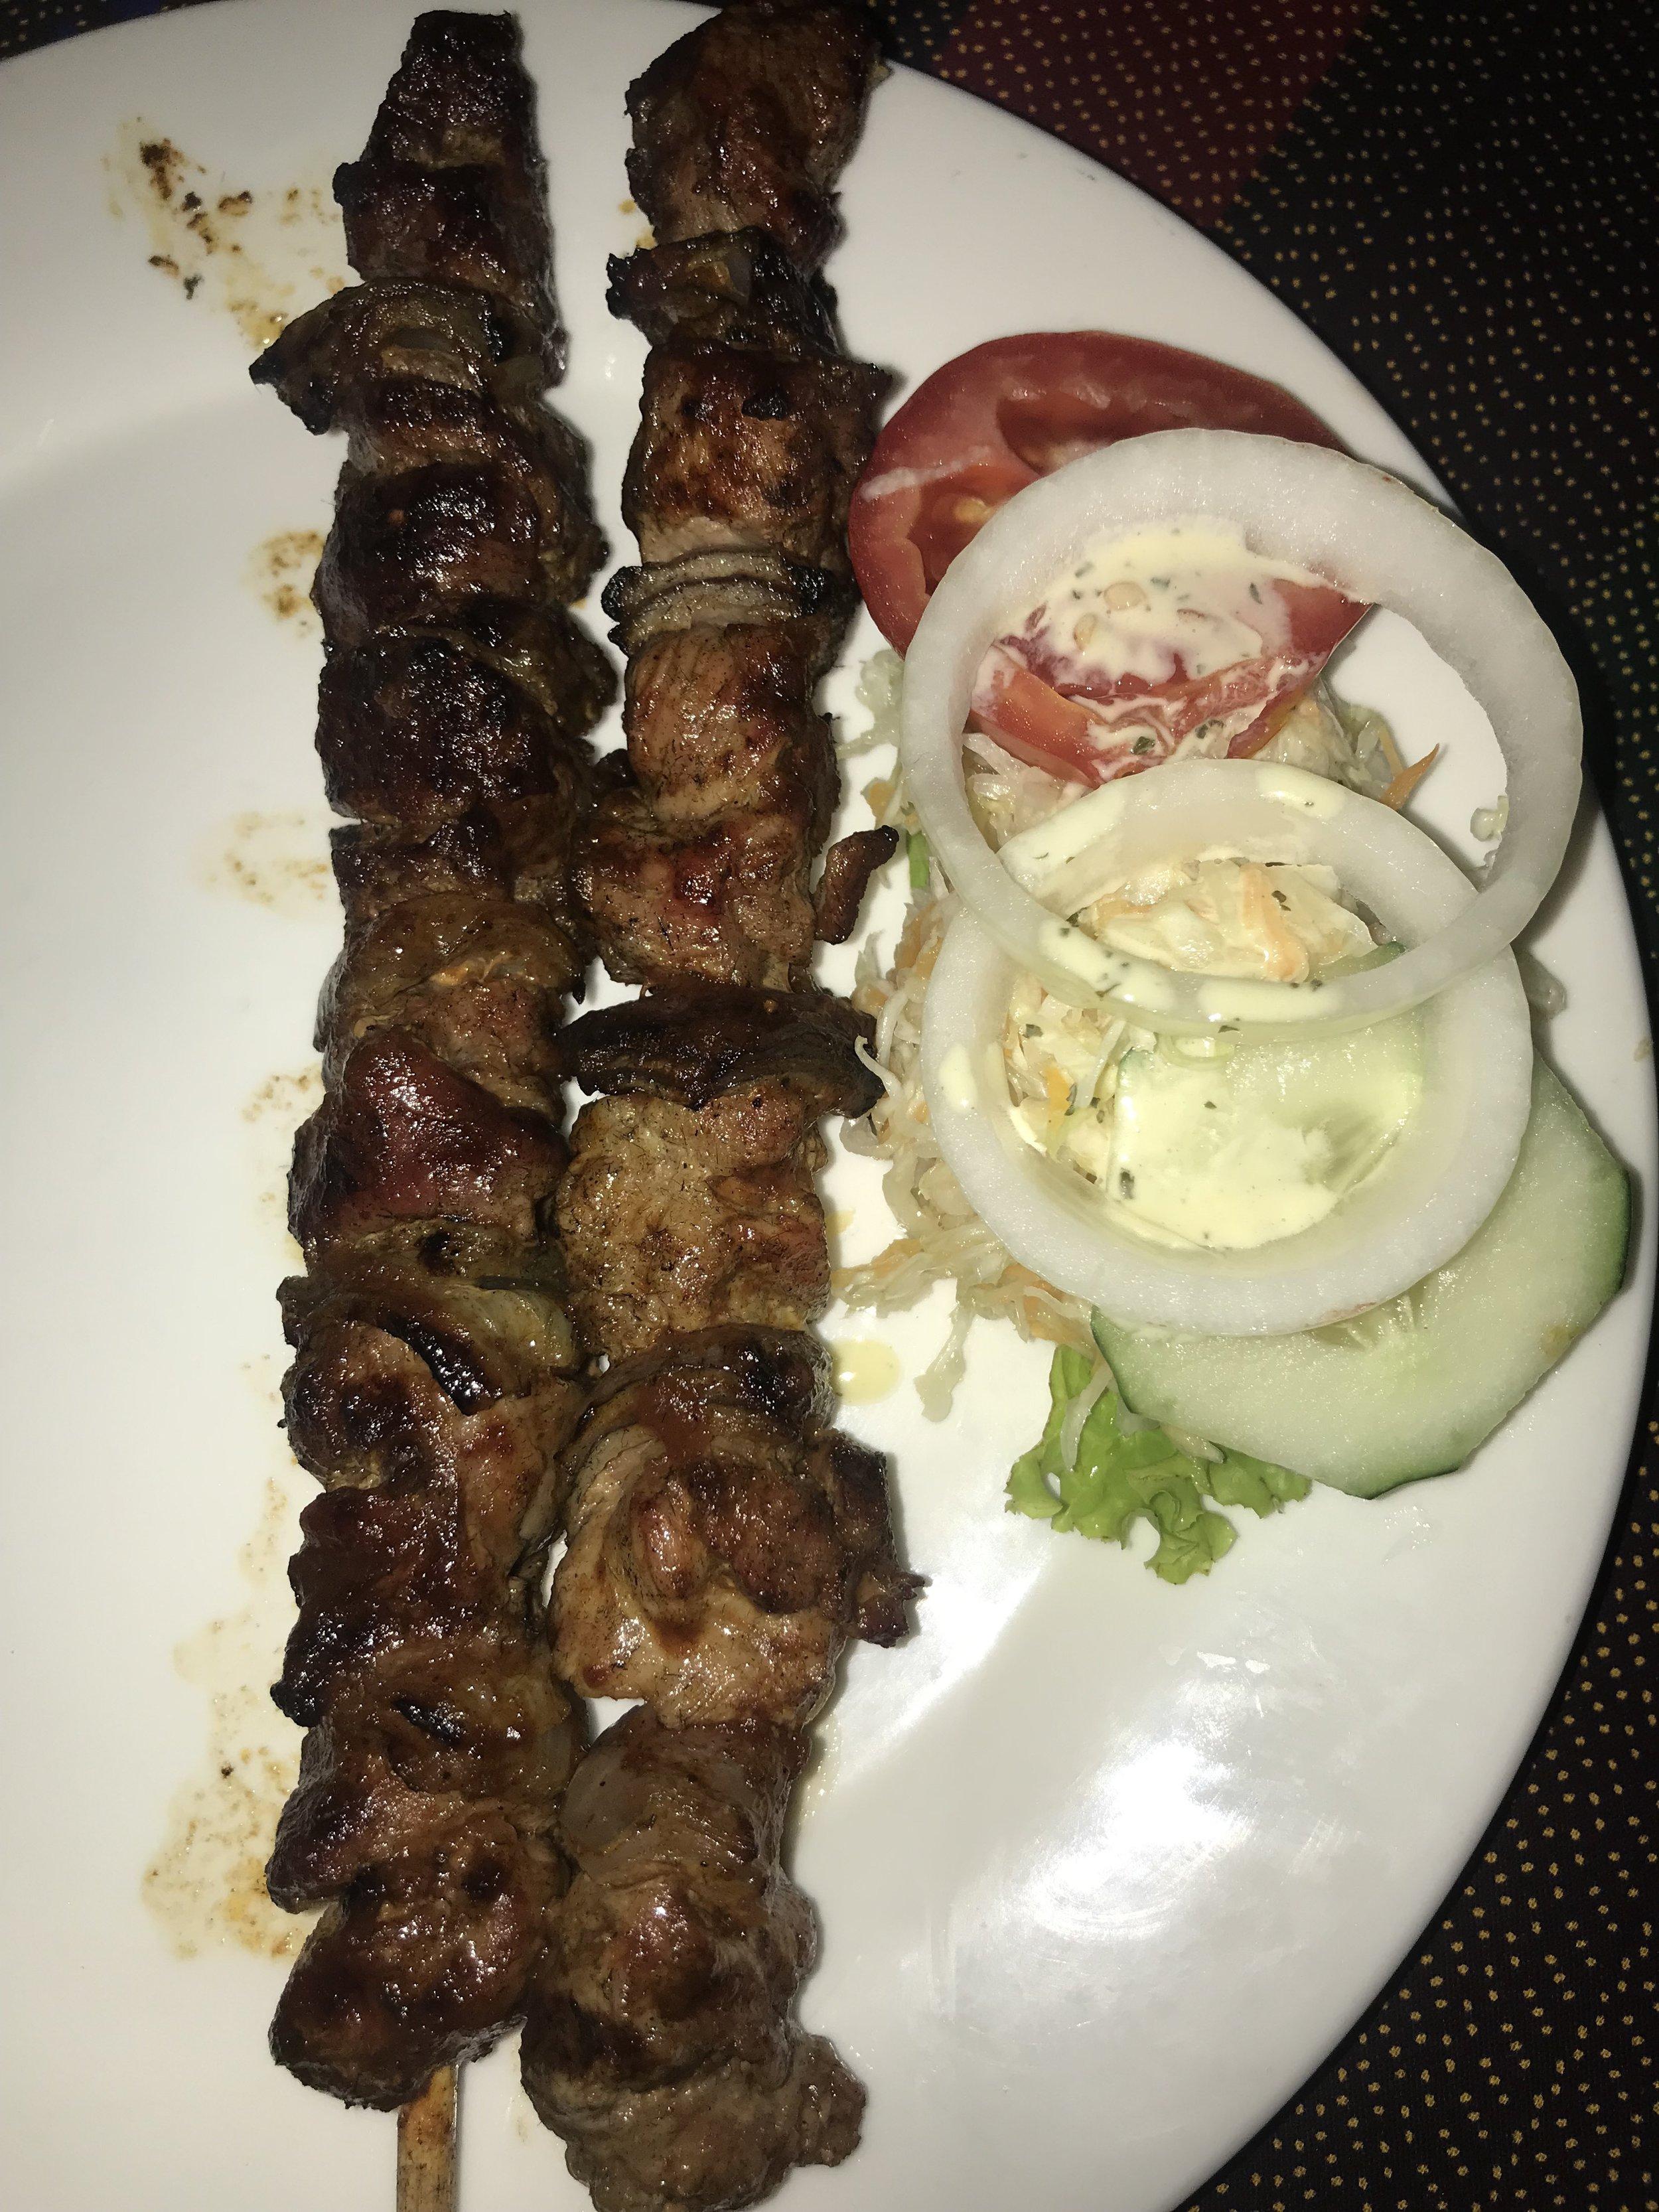 IMG_6243 2VickieRemoe-travel-kigali-rwanda-review-kwibohora25-hotels-africa.JPG